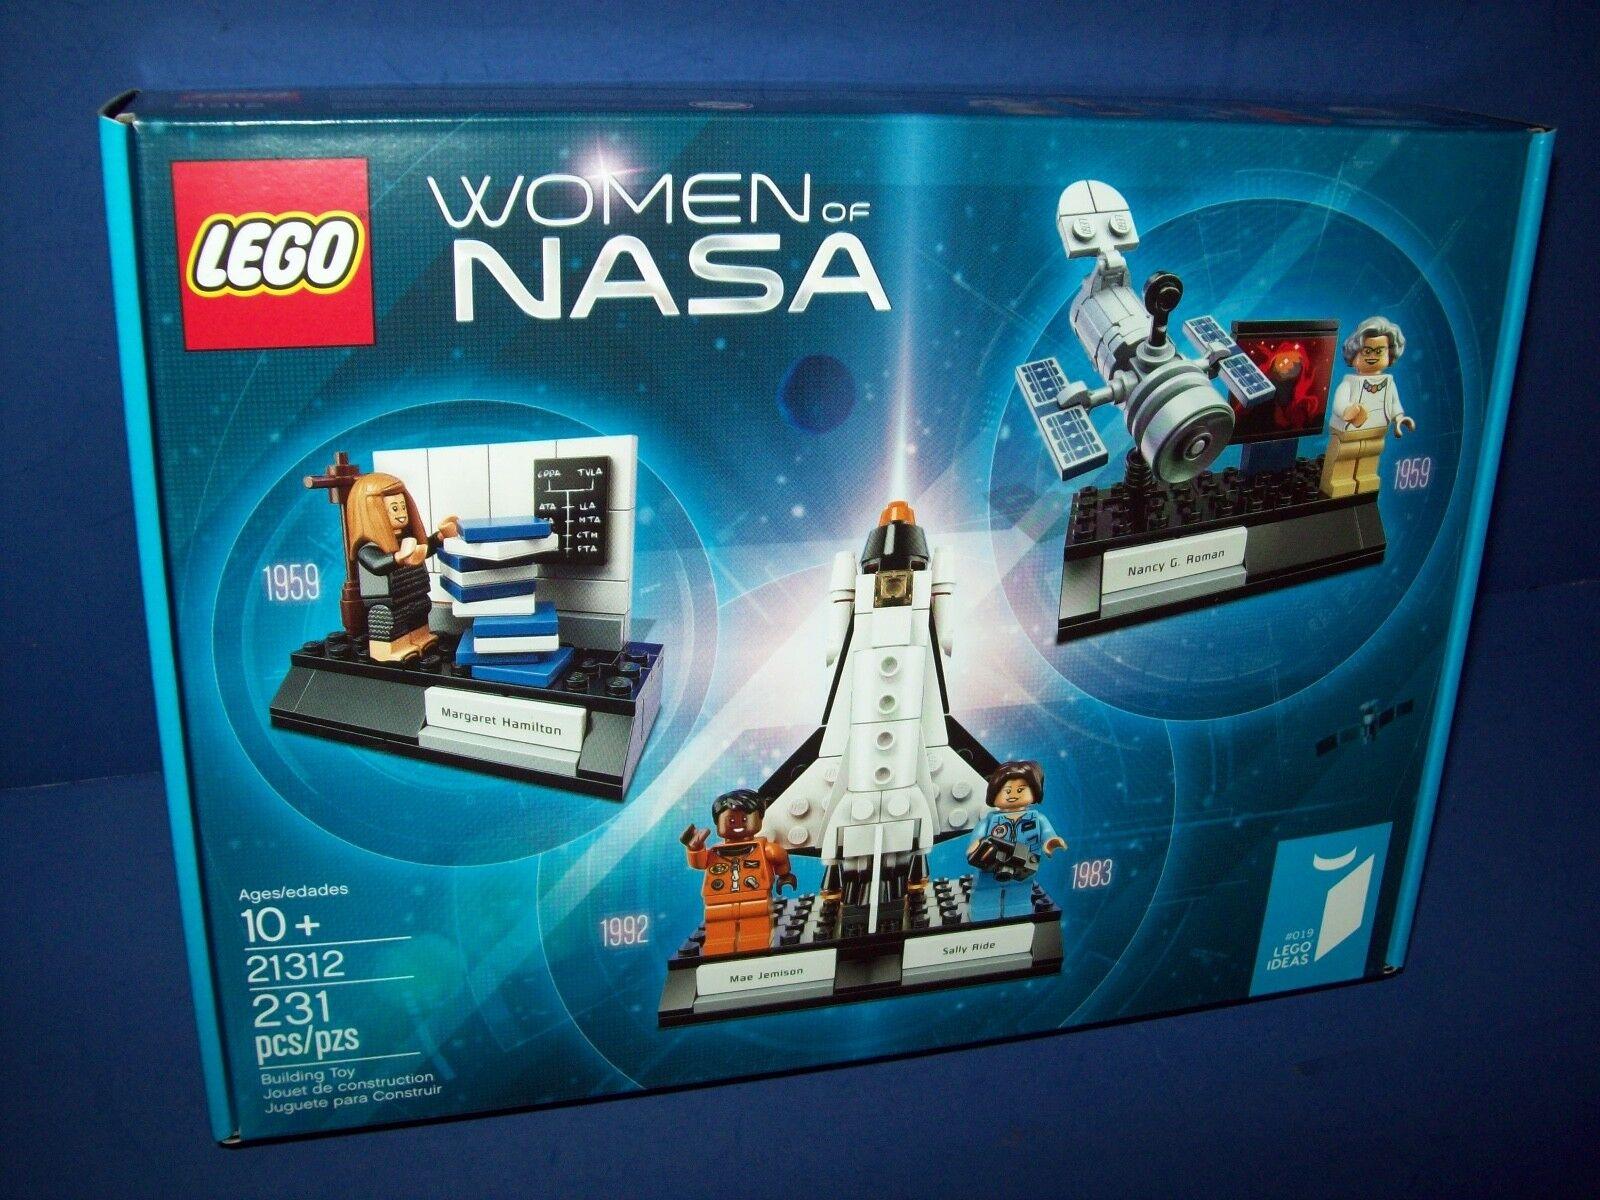 LEGO 21312 IDEAS CUSOO Women of NASA Mini Shuttle Sealed.In Hand. free ship